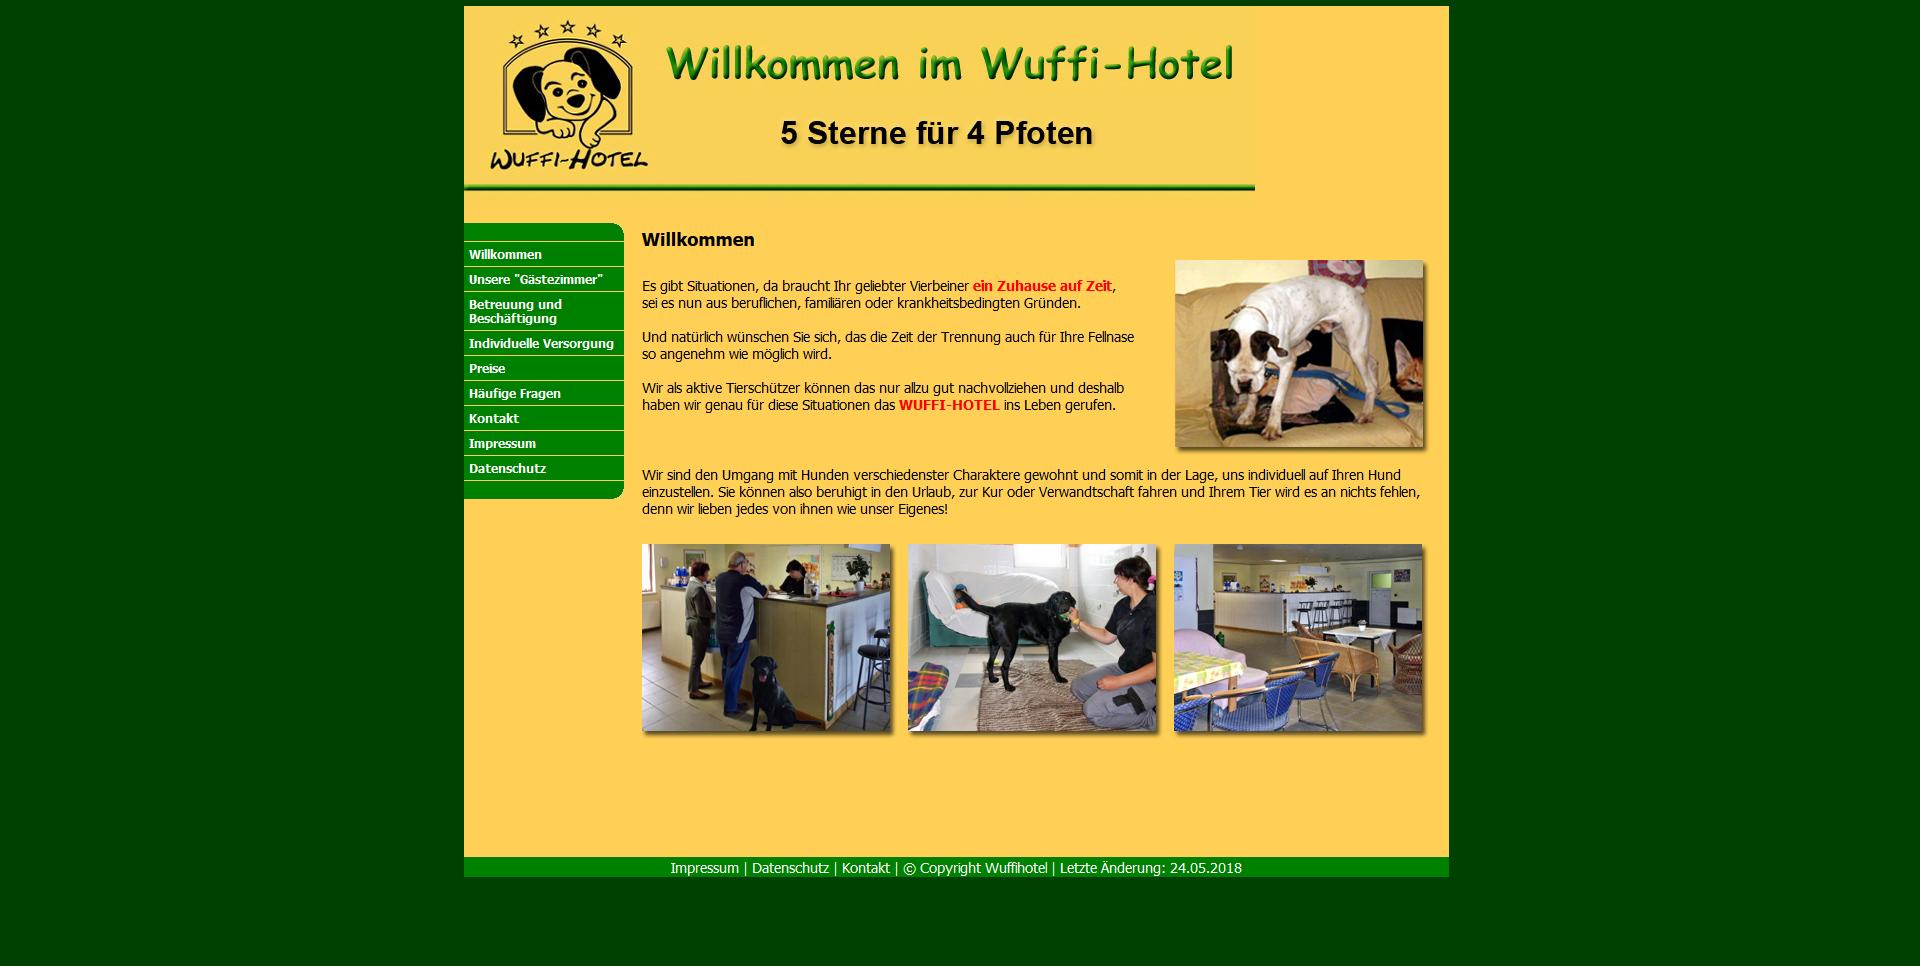 WUFFI-Hotel